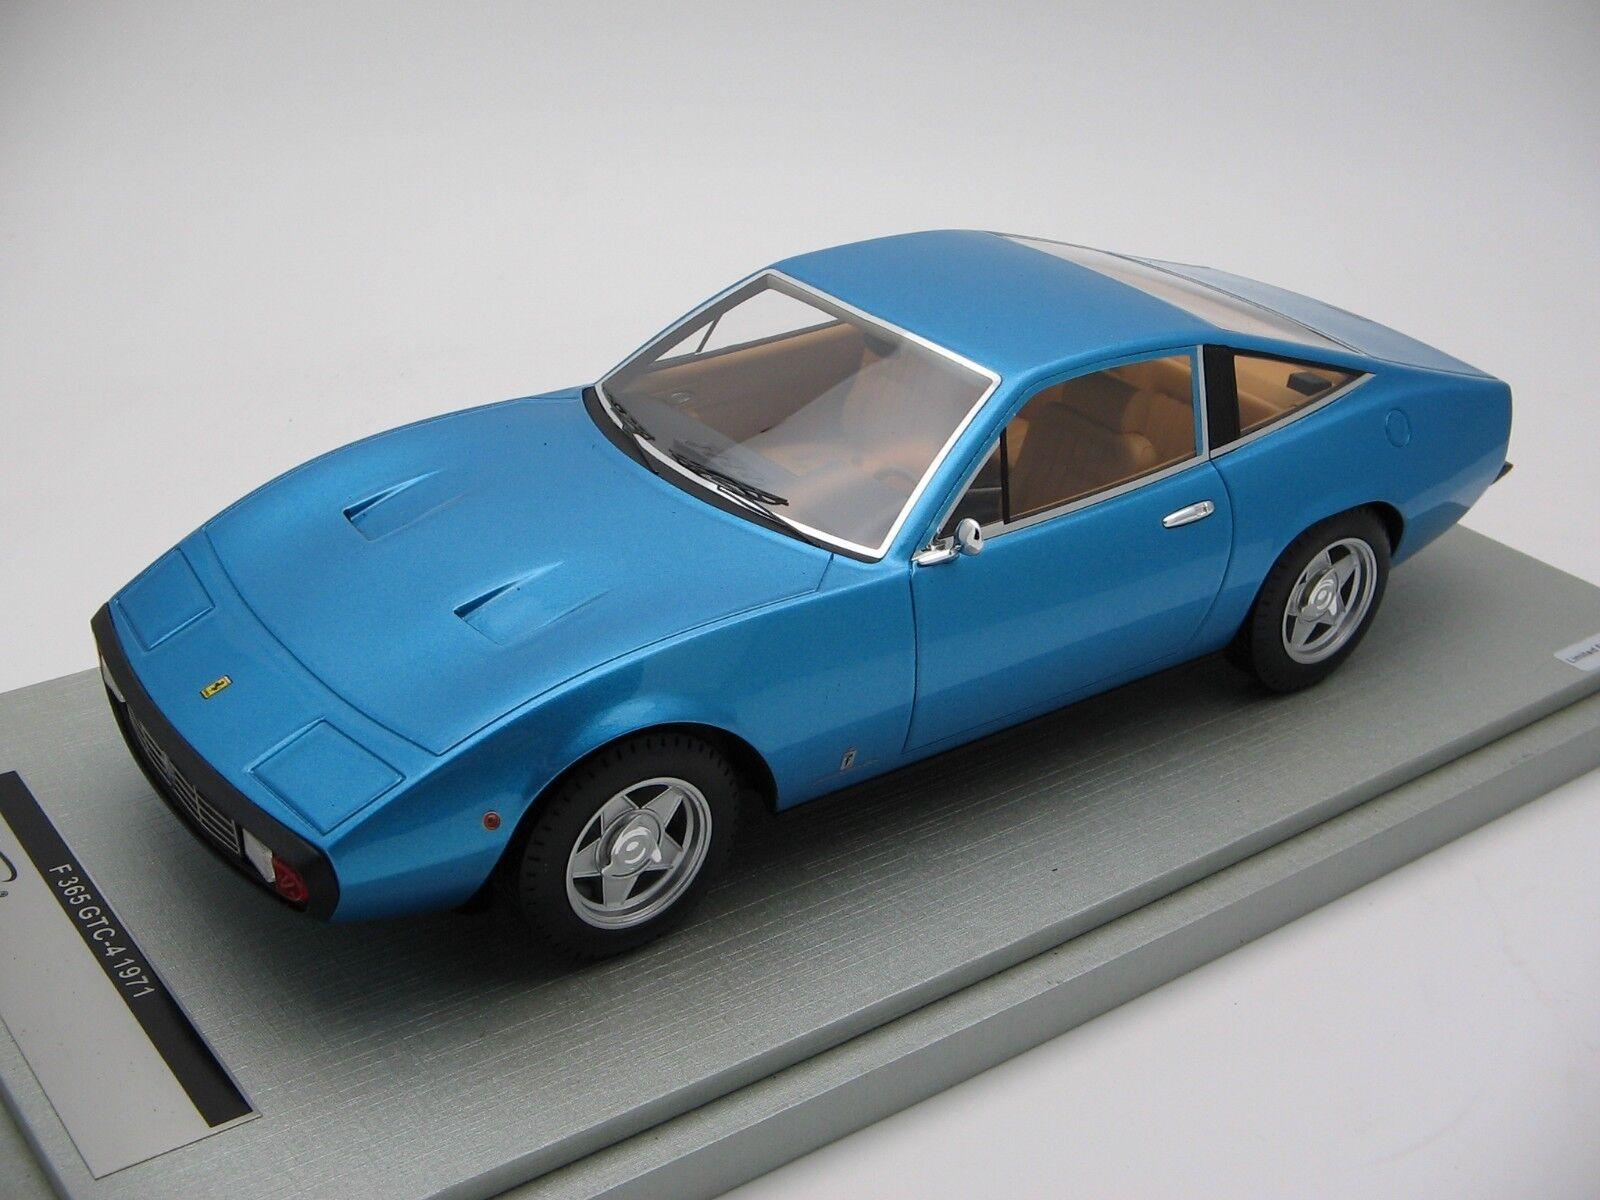 1 18 scale Tecnomodel Ferrari 365 GTC-4 Azzurro California 1971 - TM18-92C